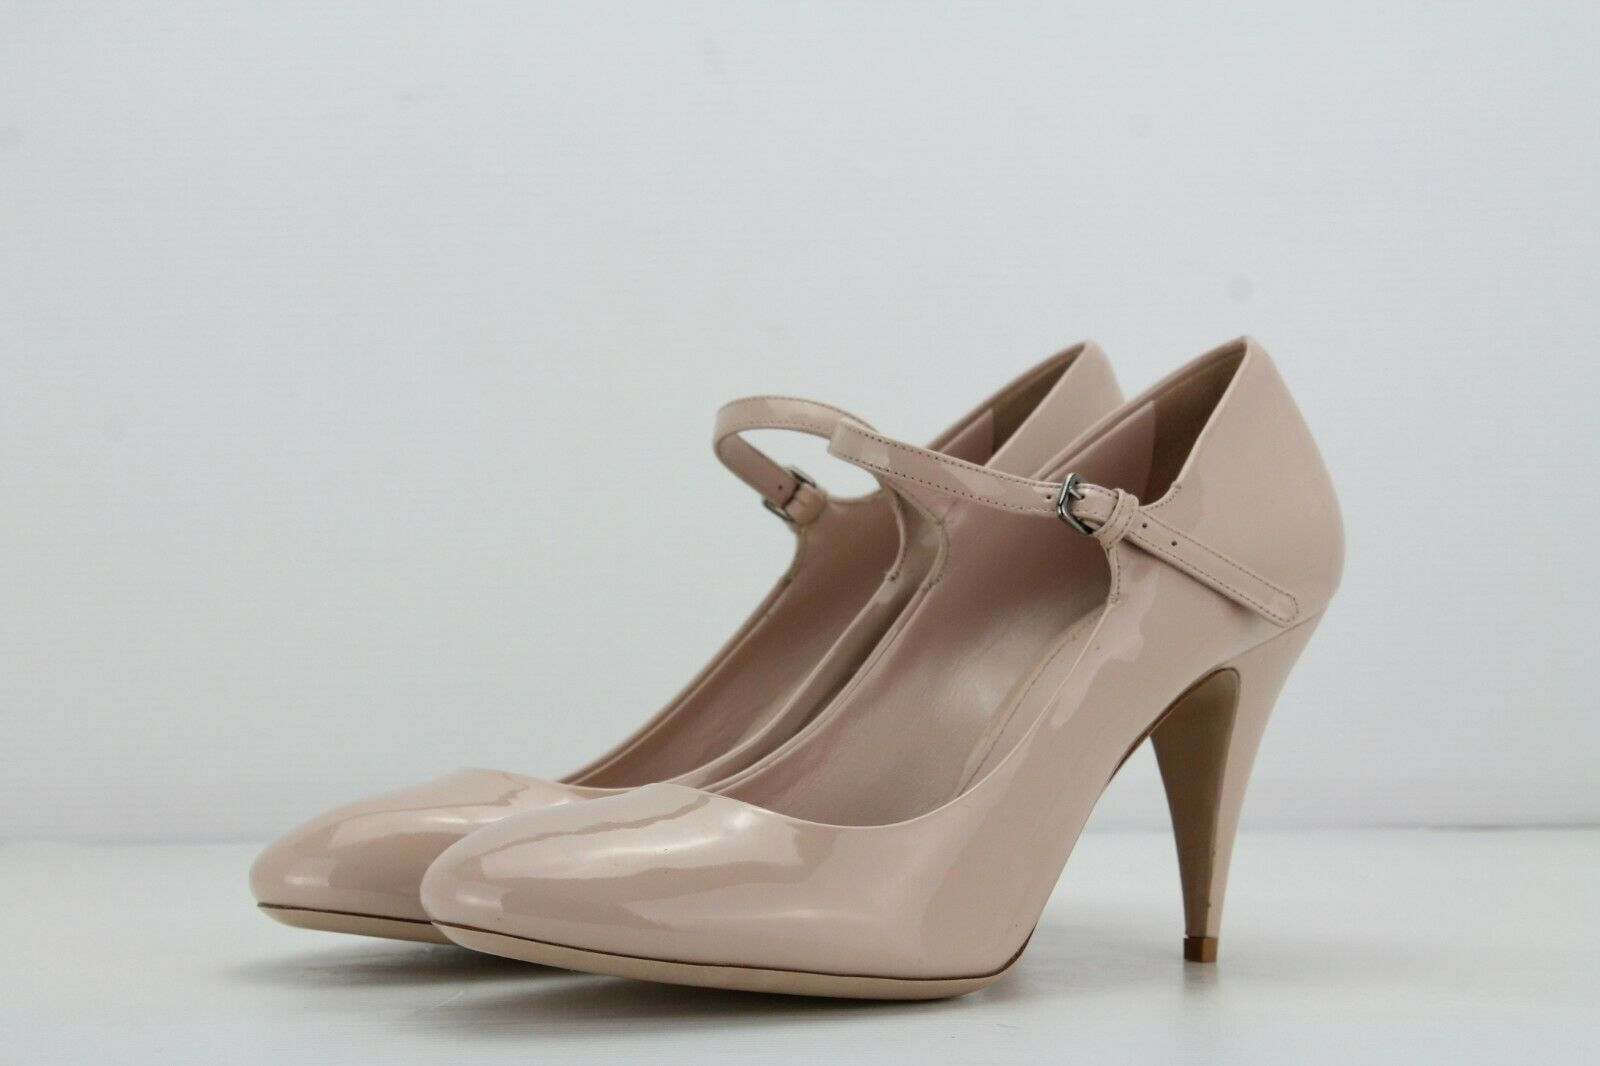 Miu Miu Nude Patent Leather Court shoes, Size  UK8.5 EU41.5